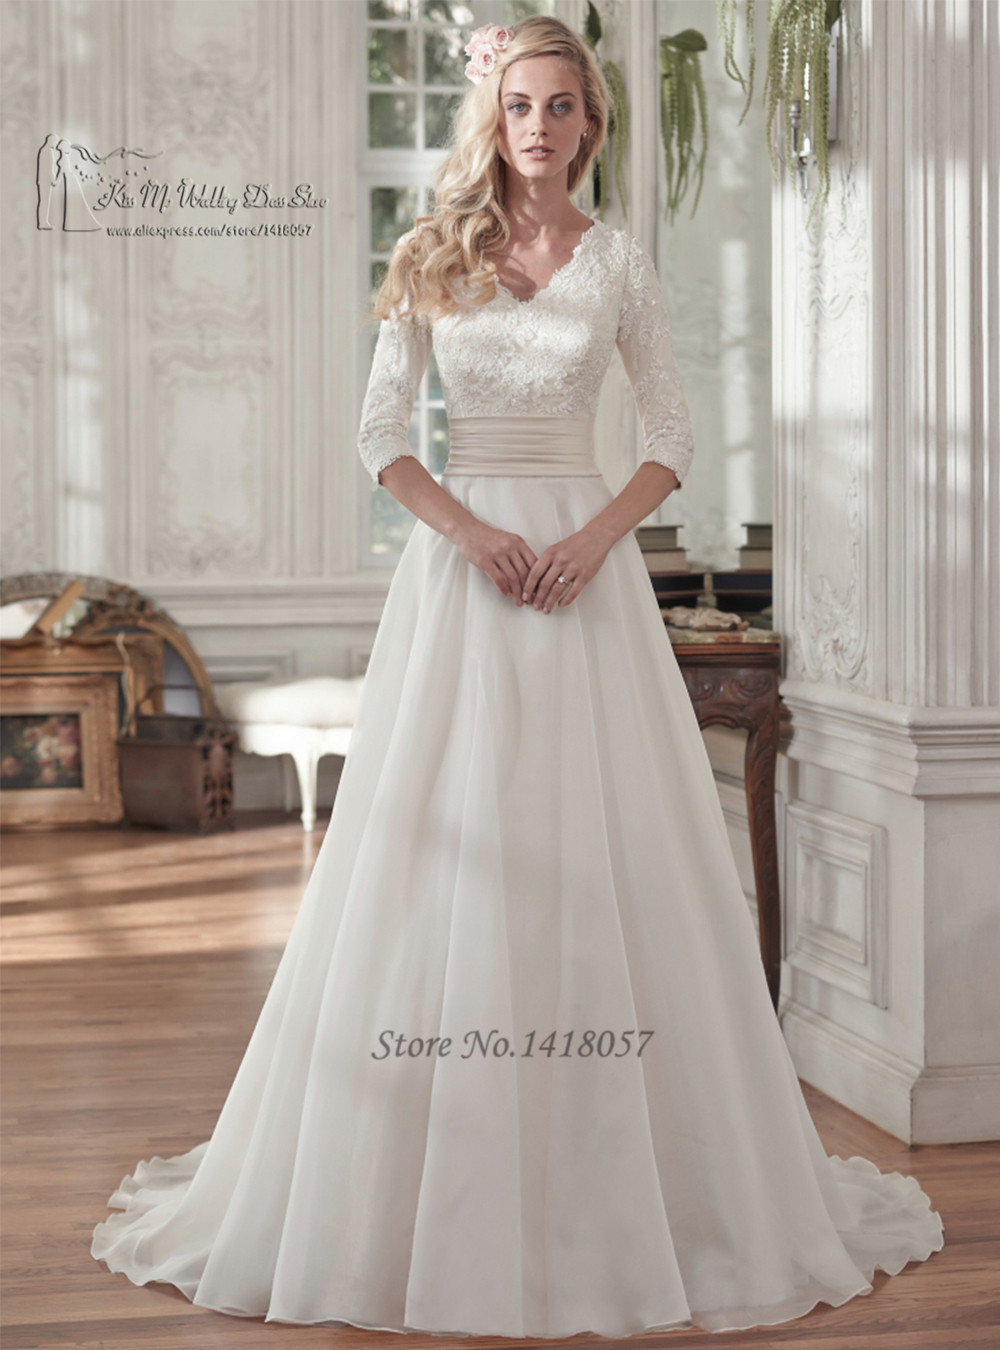 Vestido de Noiva 2016 Vintage Wedding Dresses Lace 3 4 Sleeves A Line Bridal Gowns Custom